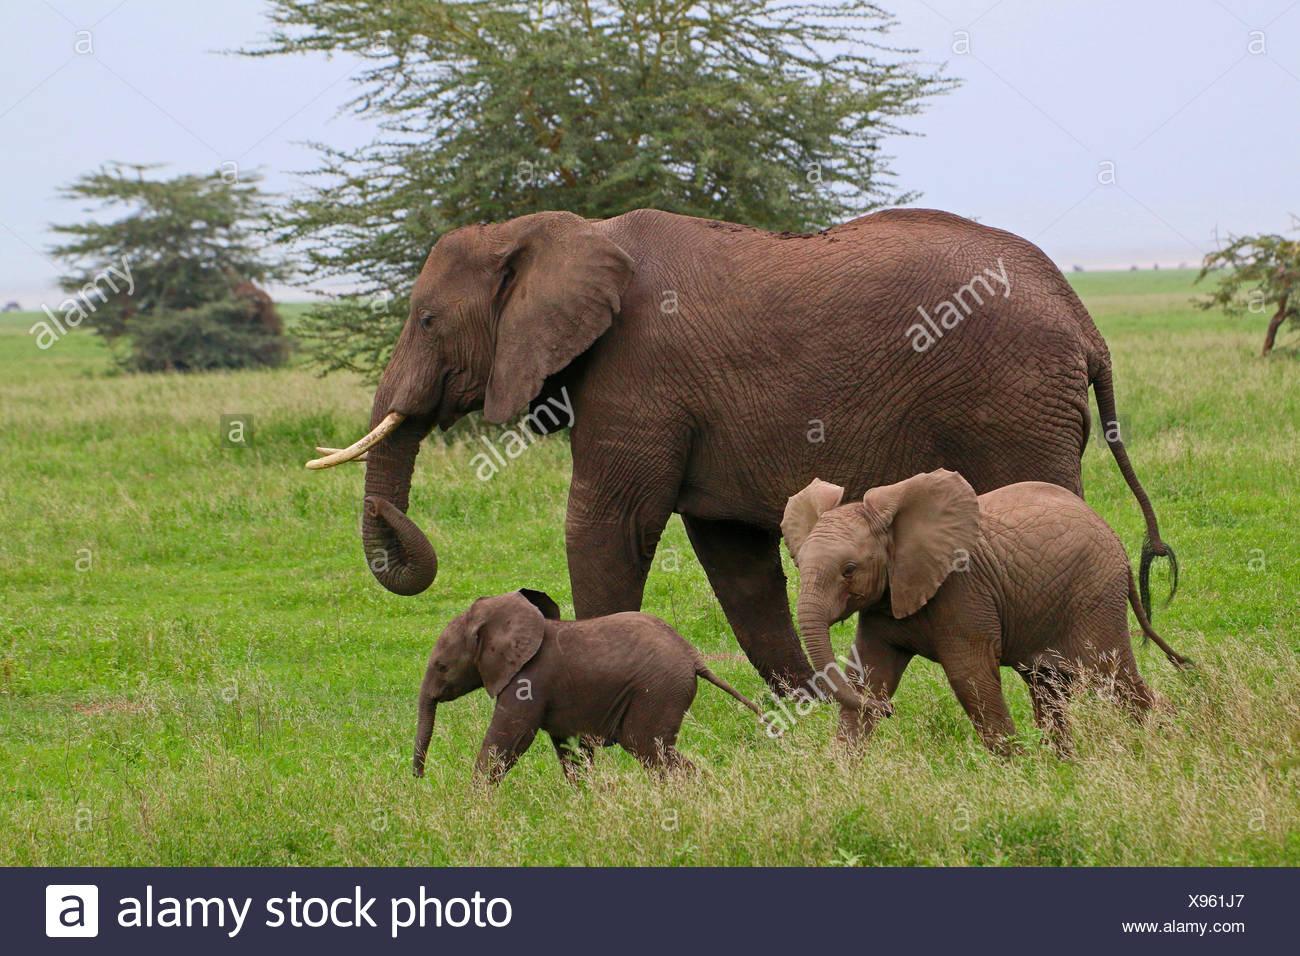 African elephant (Loxodonta africana), cow elephant with two calves , Tanzania, Serengeti National Park - Stock Image